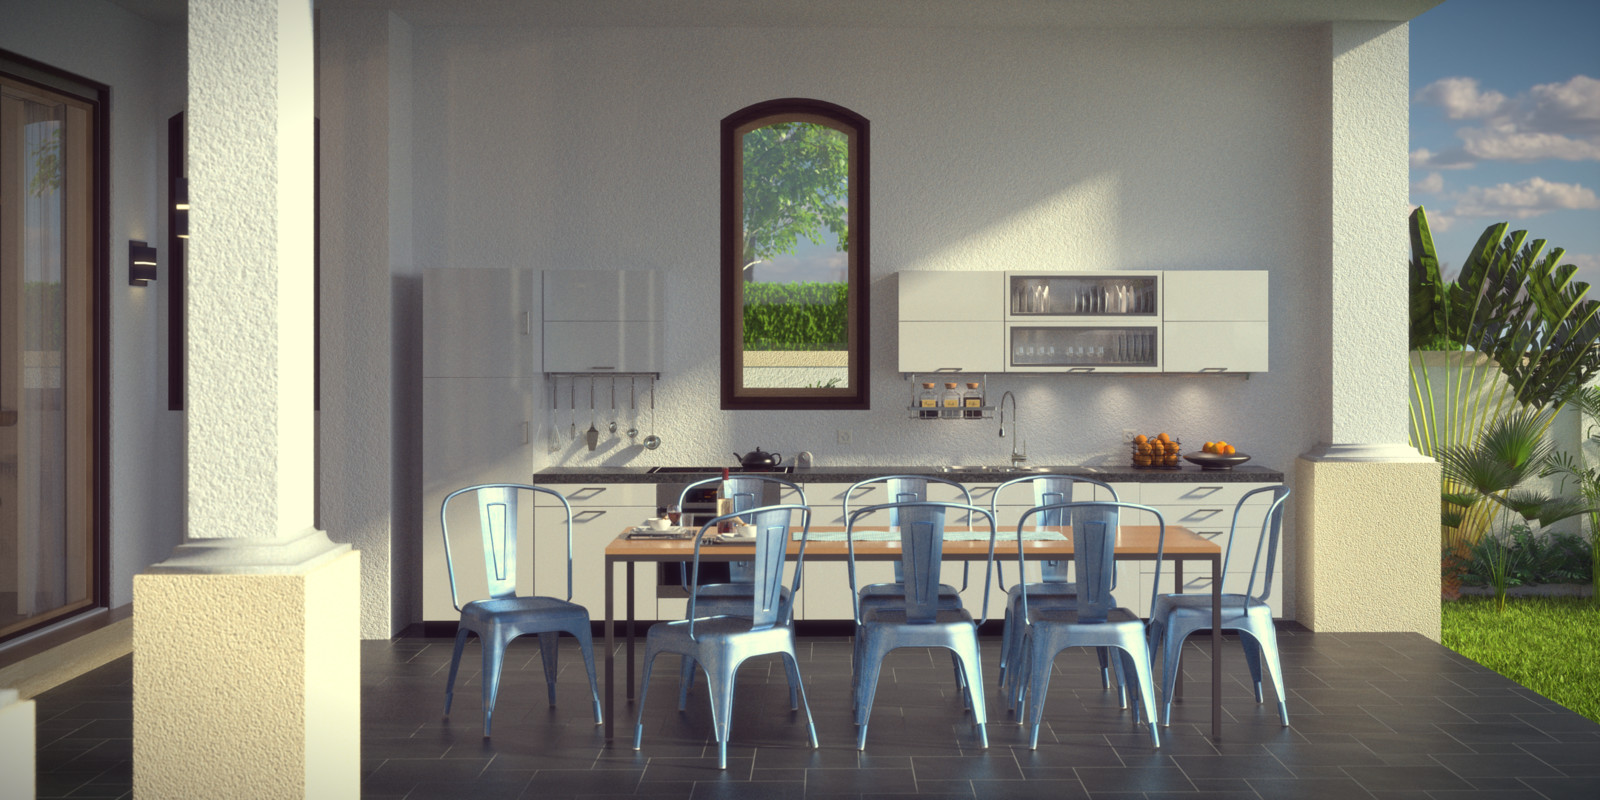 SketchUp + Thea Render  Seagrove Beach House: Ext Kit 03 D Glare Lumina 2160 × 1080 Presto MC Bucket